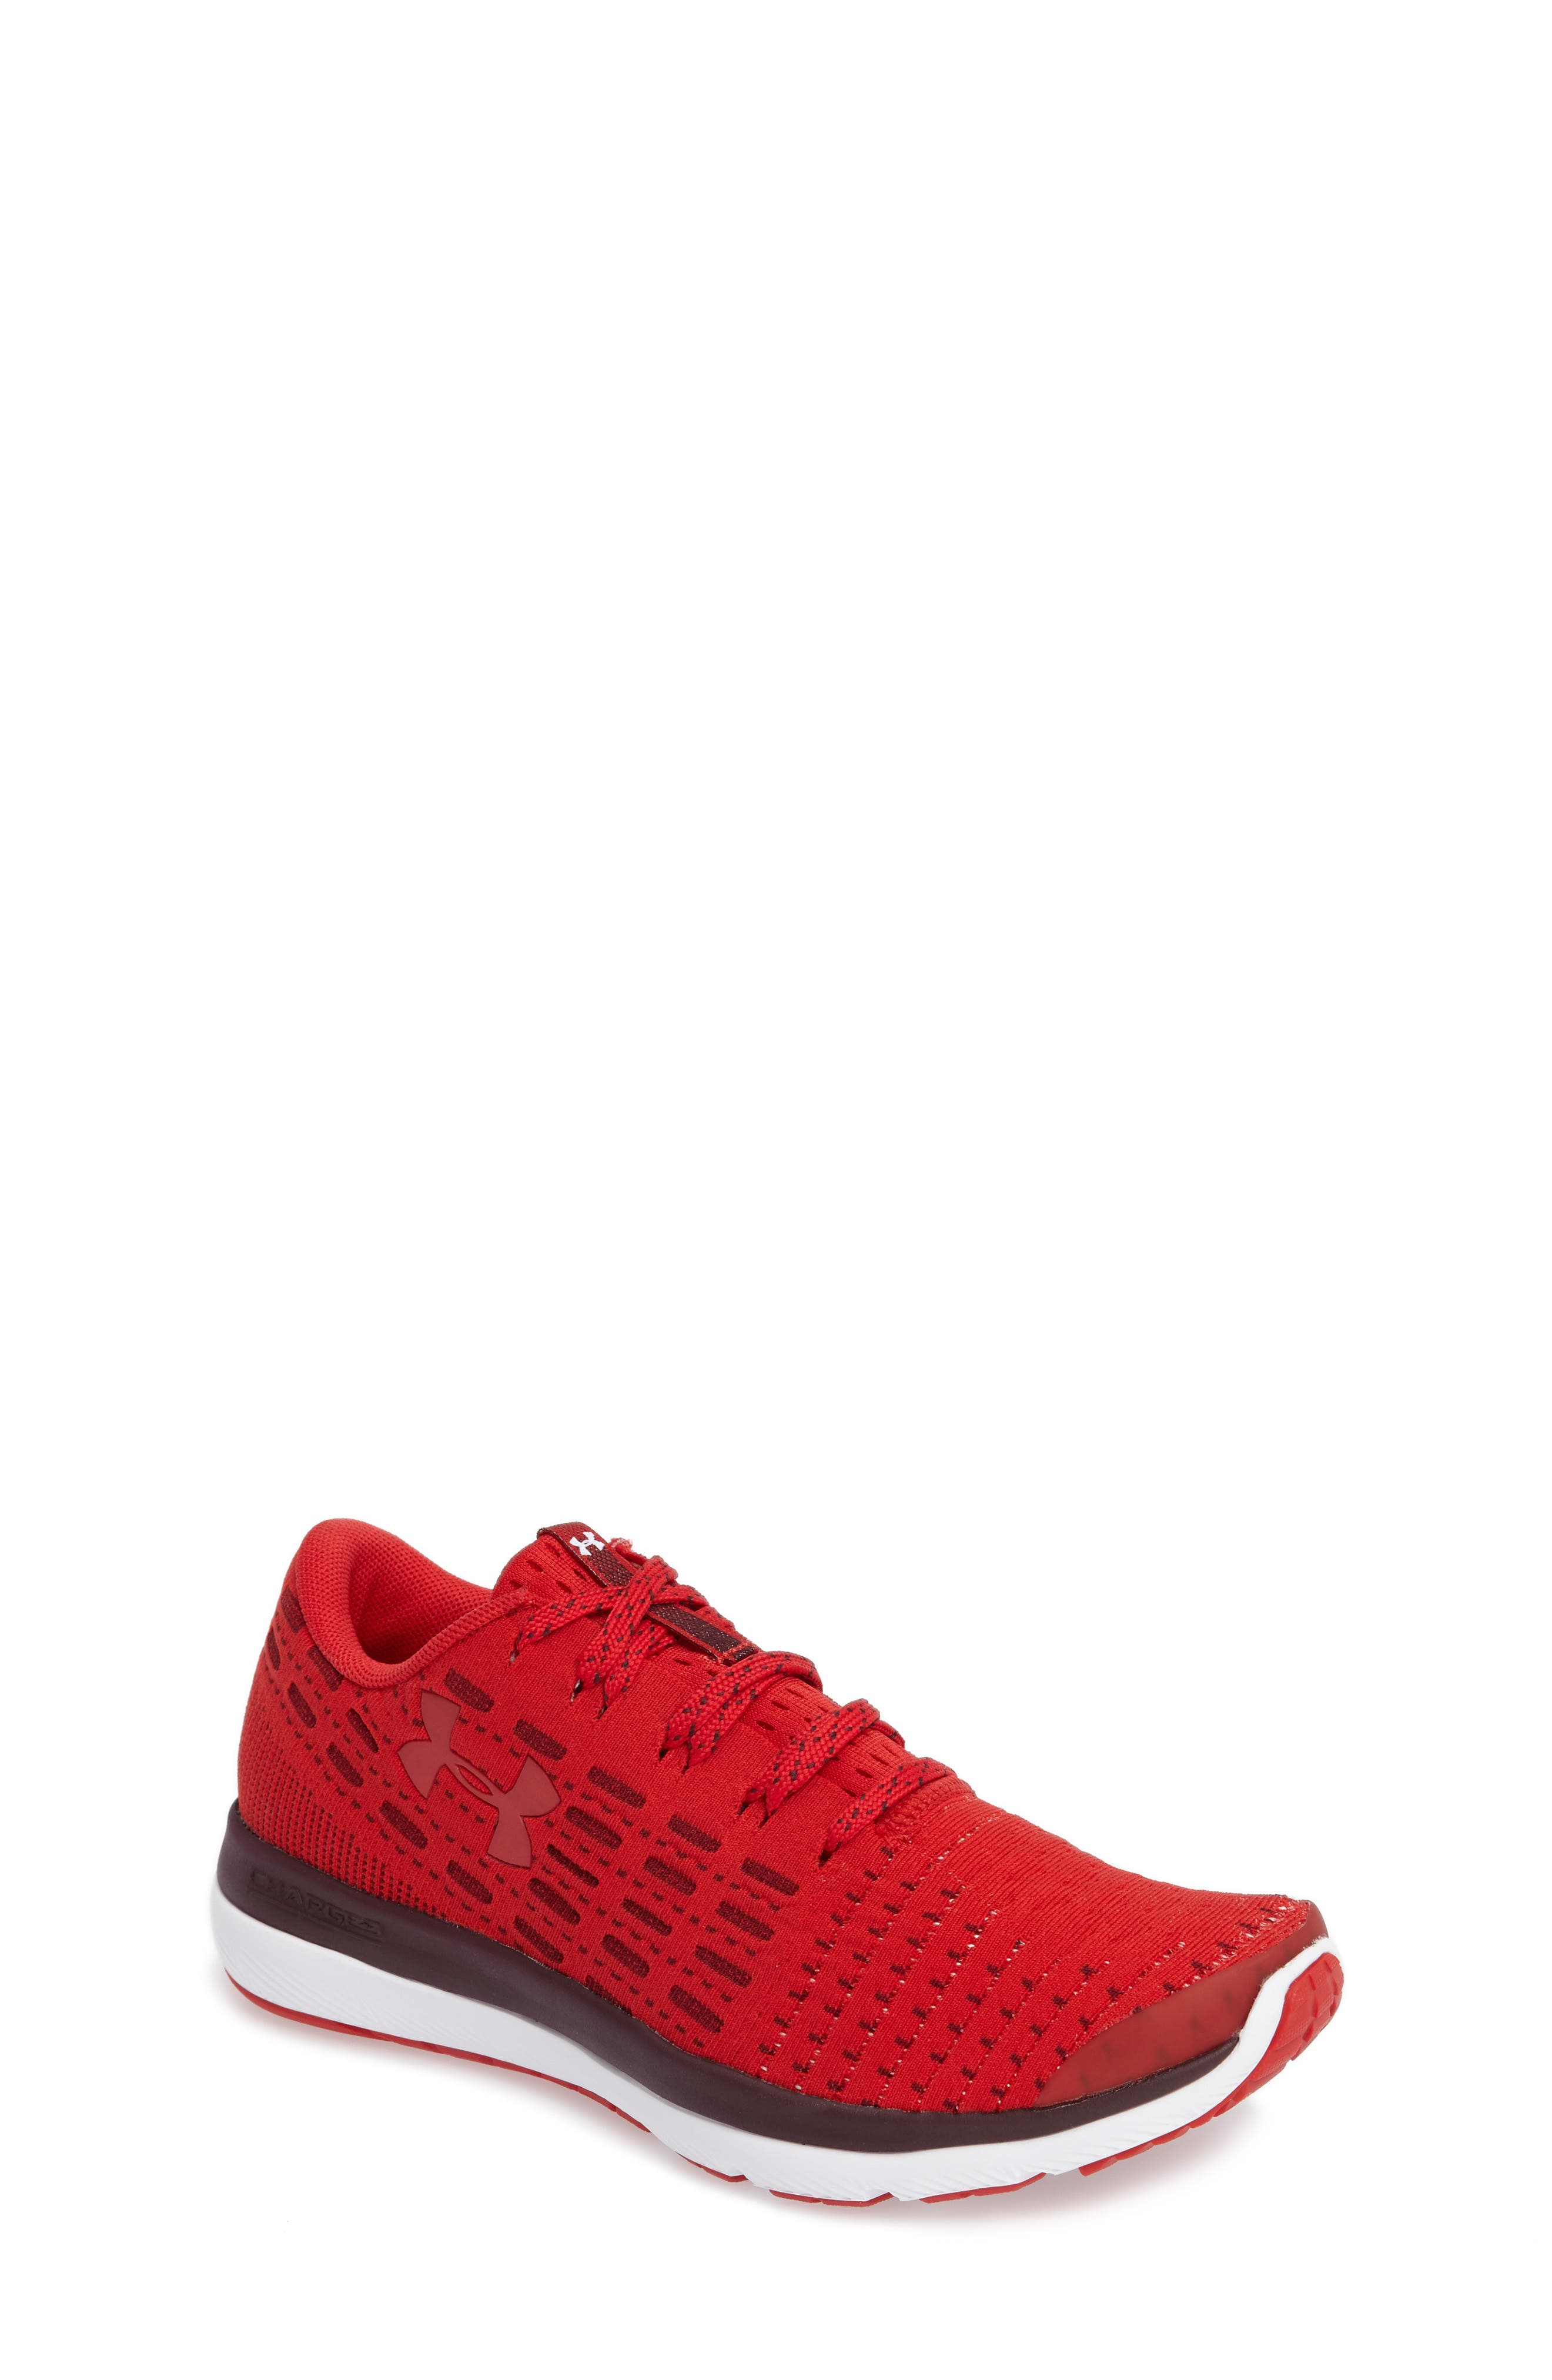 UNDER ARMOUR Primed Sneaker